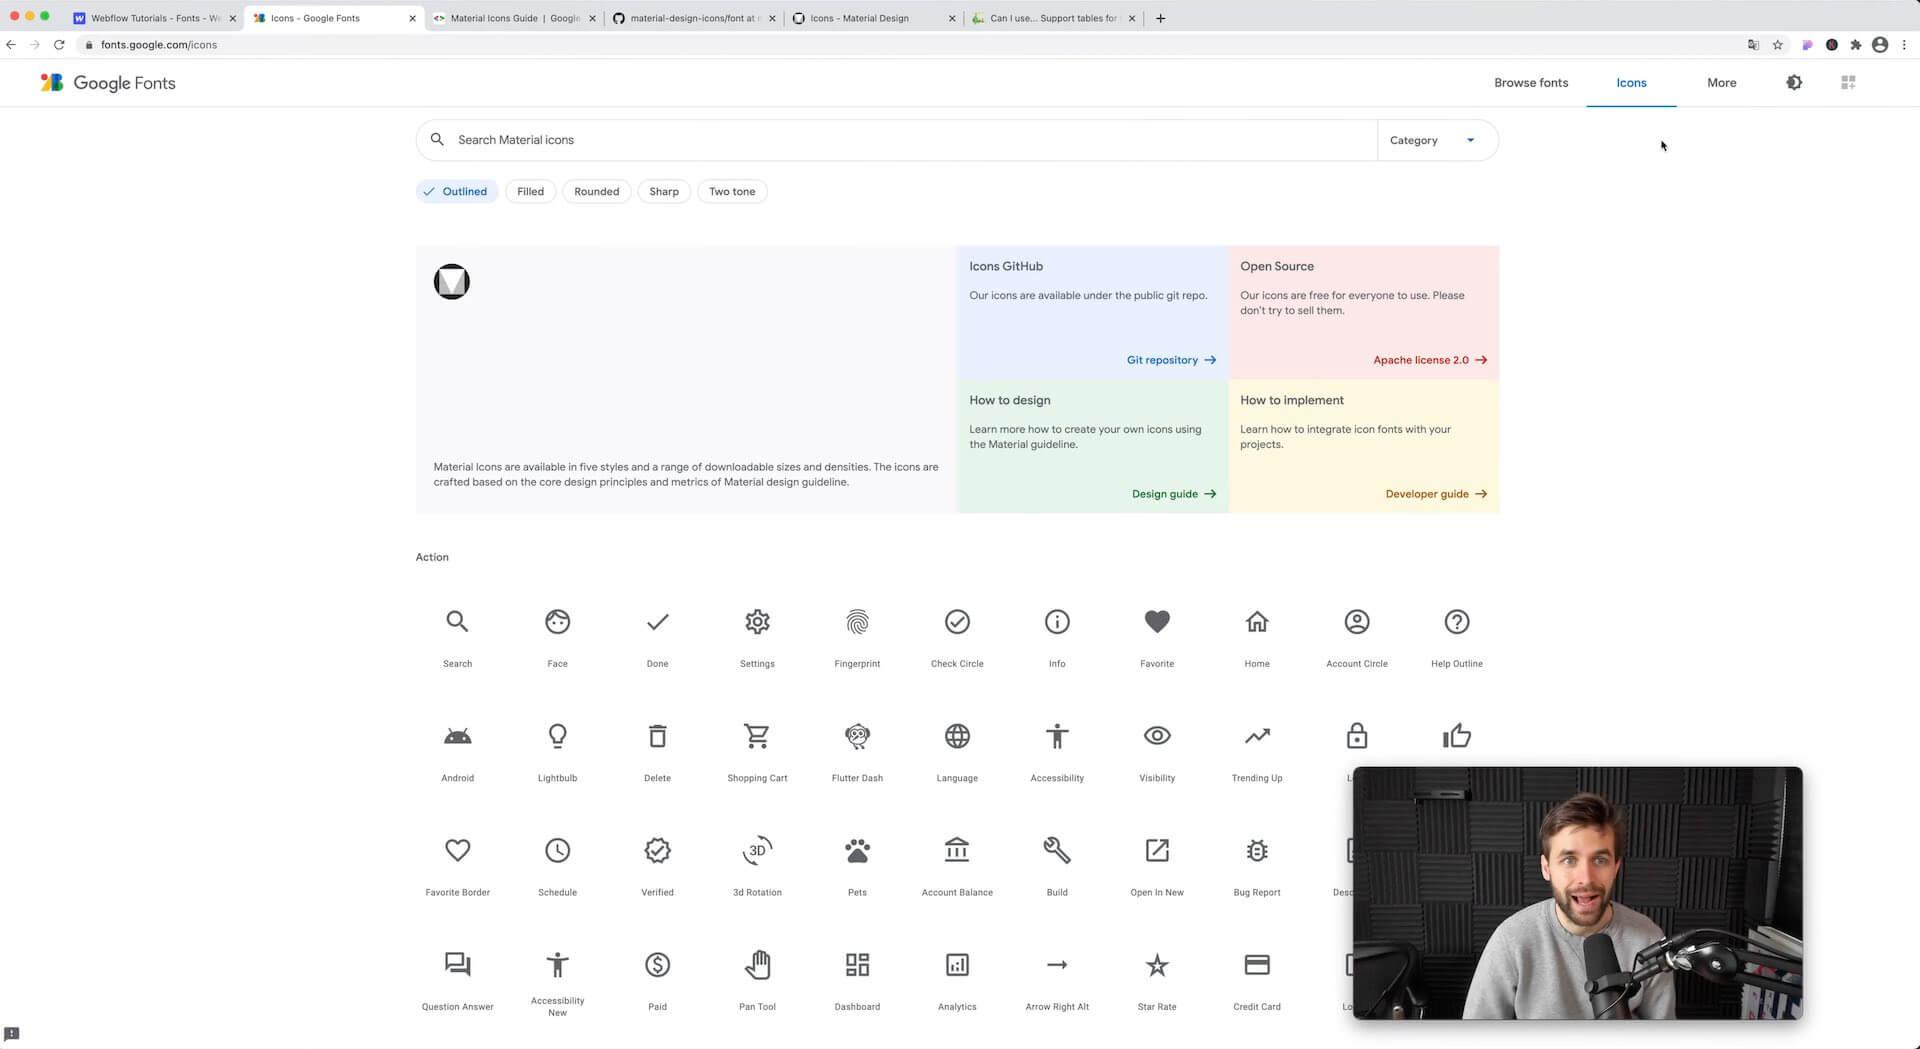 Google Font Icons